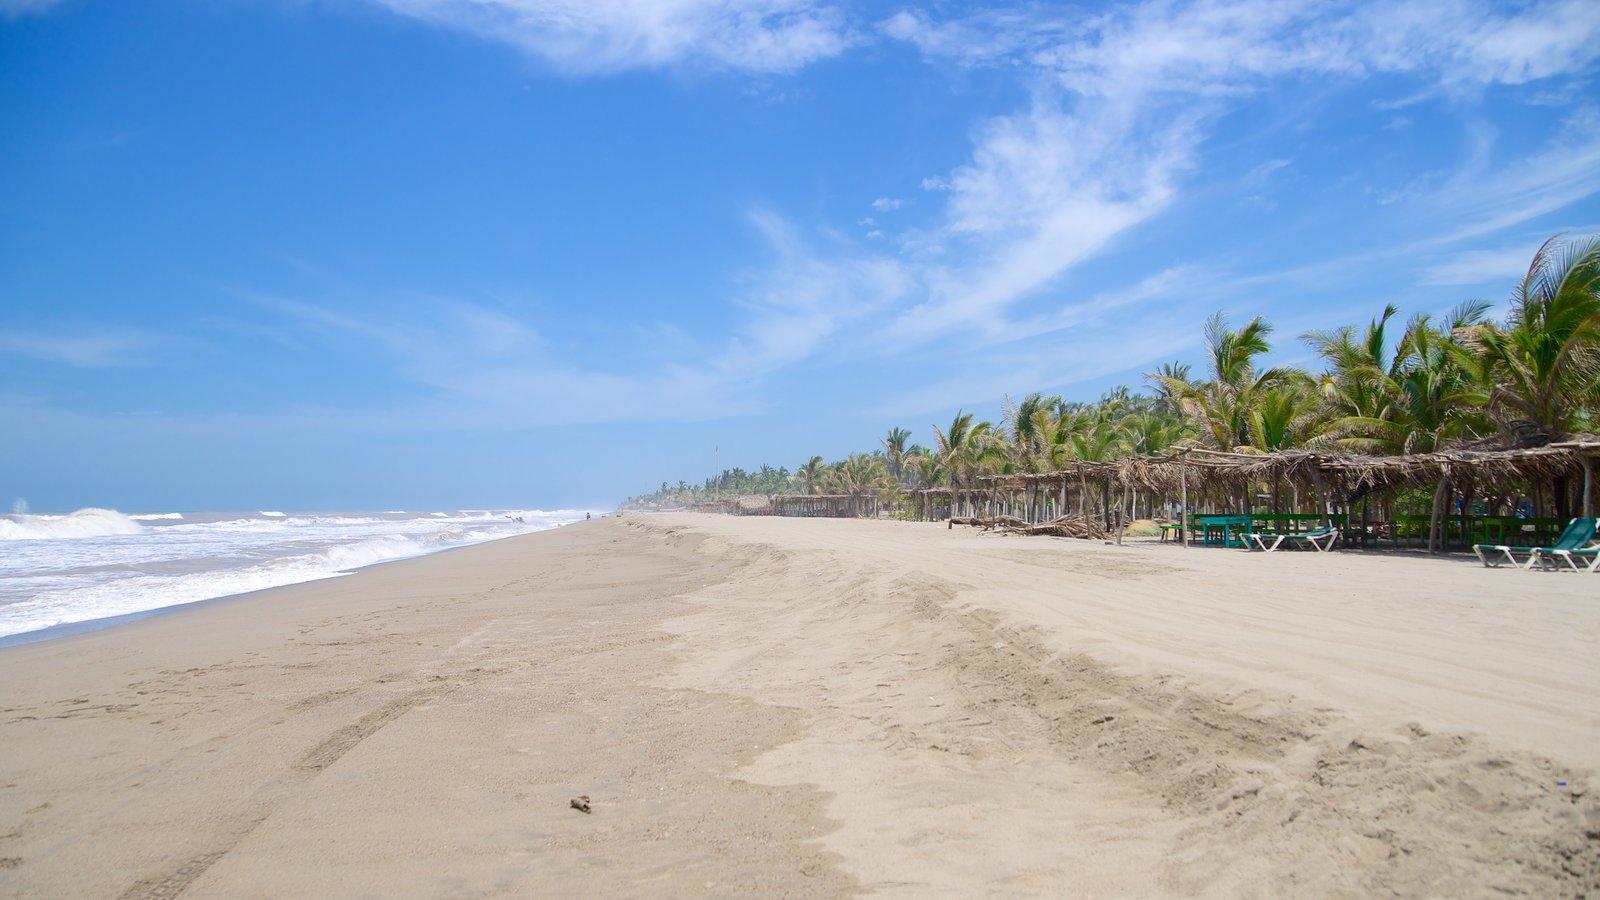 Playa De Barra Vieja Showing A Beach And Tropical Scenes